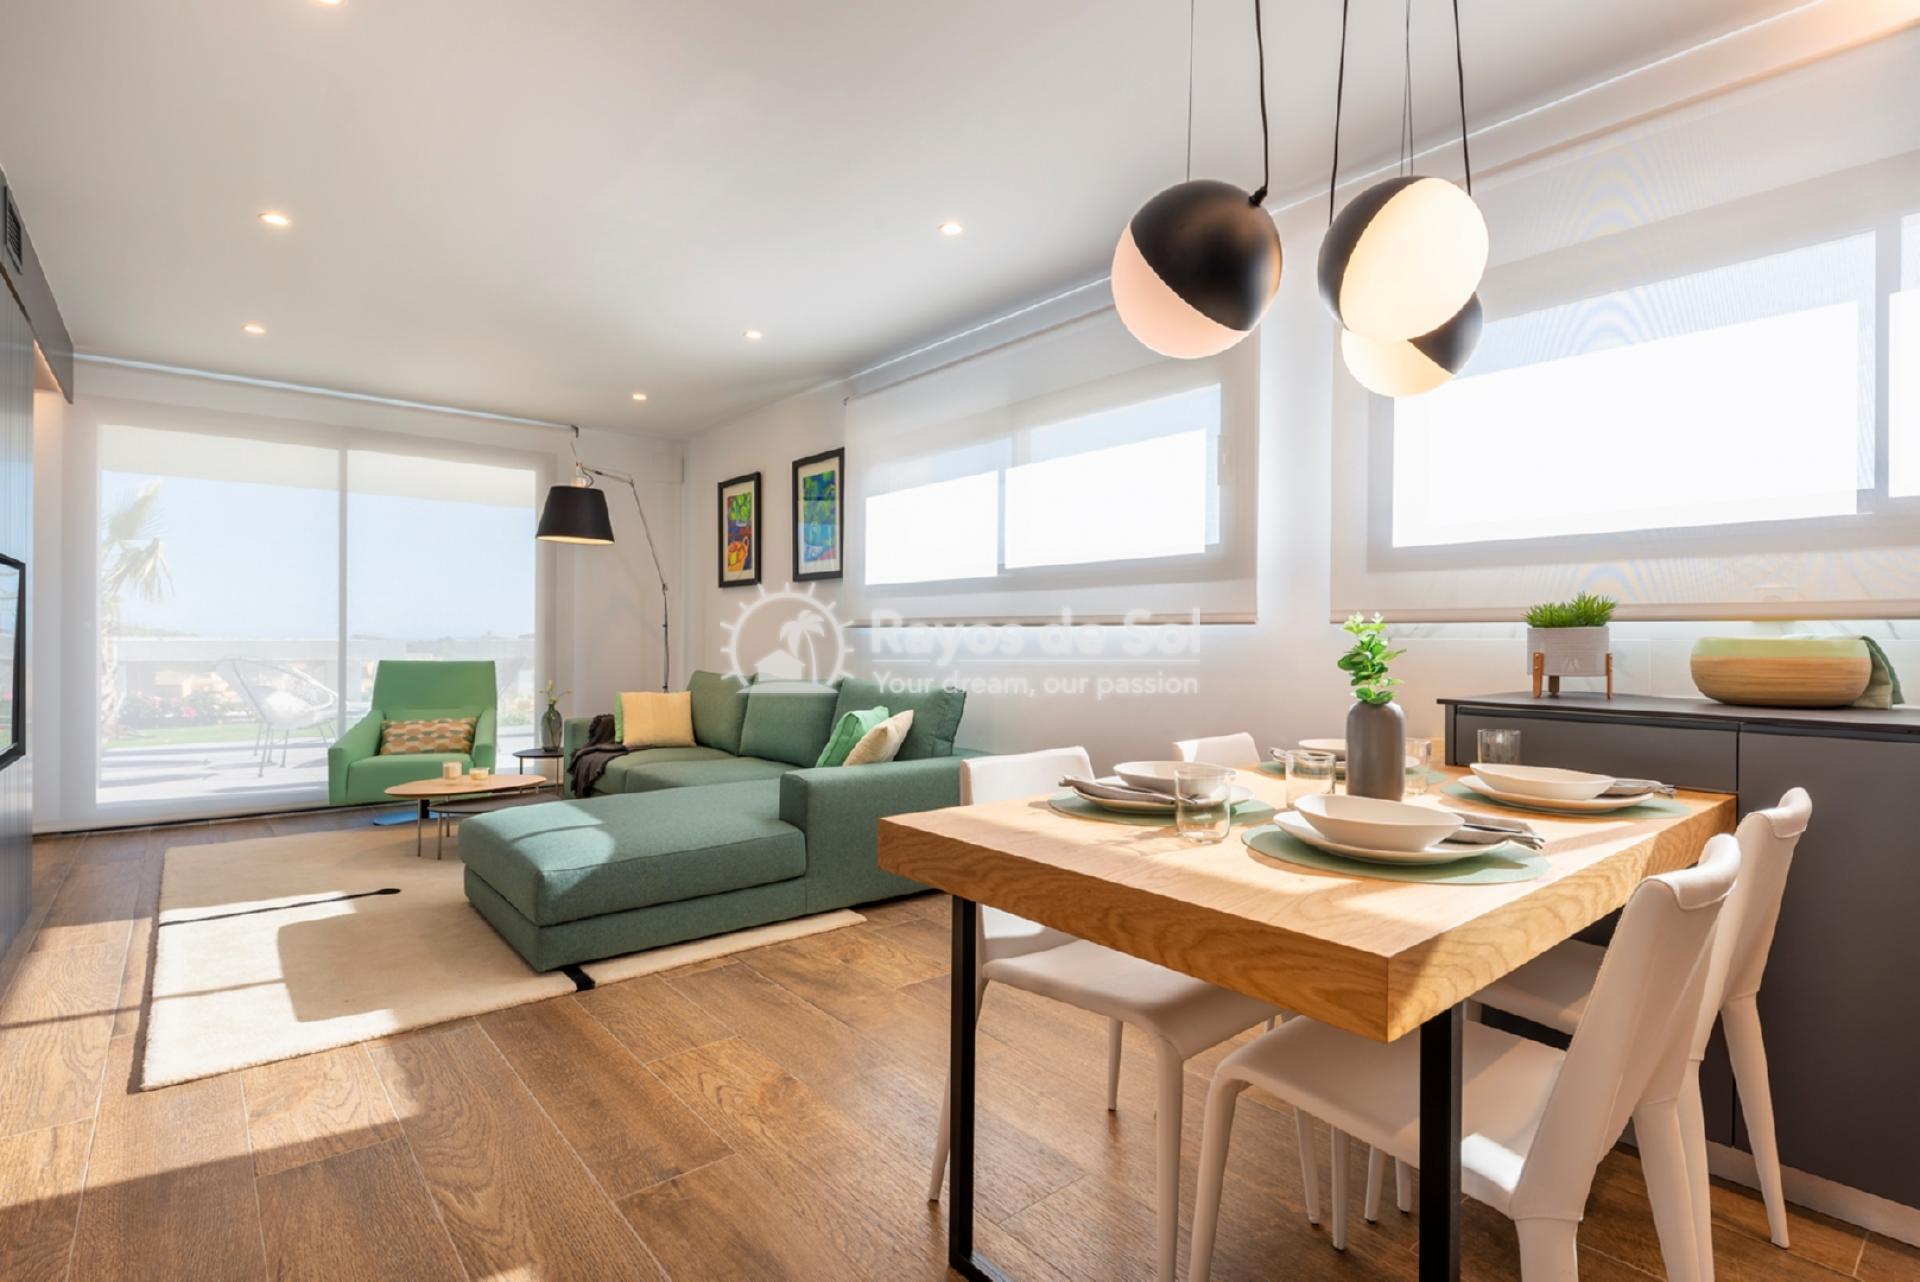 Apartment in Cumbre del Sol, Benitachell, Costa Blanca (ov-ph003) - 6